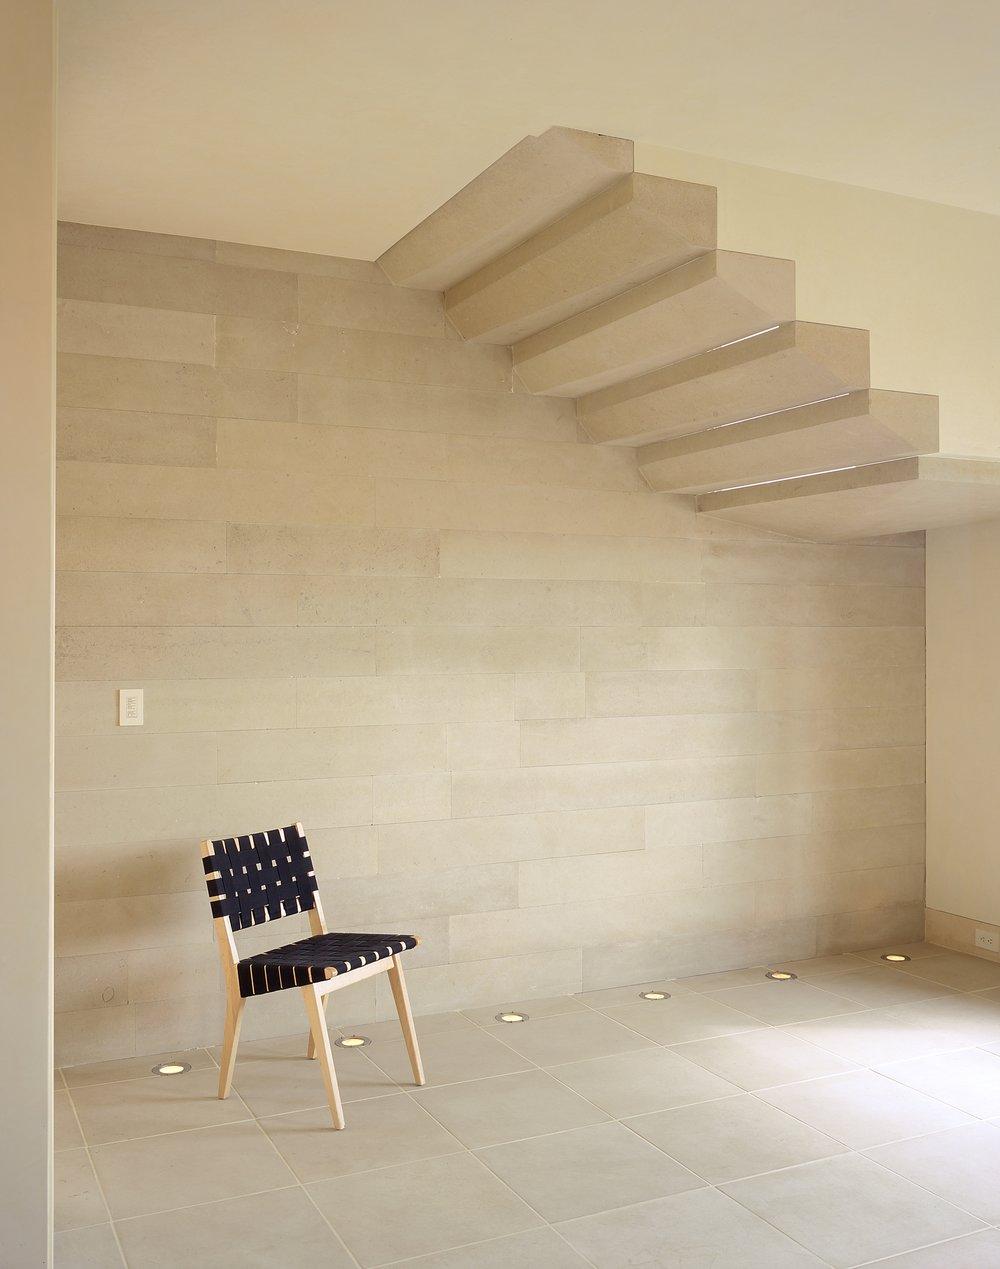 Conf.+Room+Stone+Wall.jpg